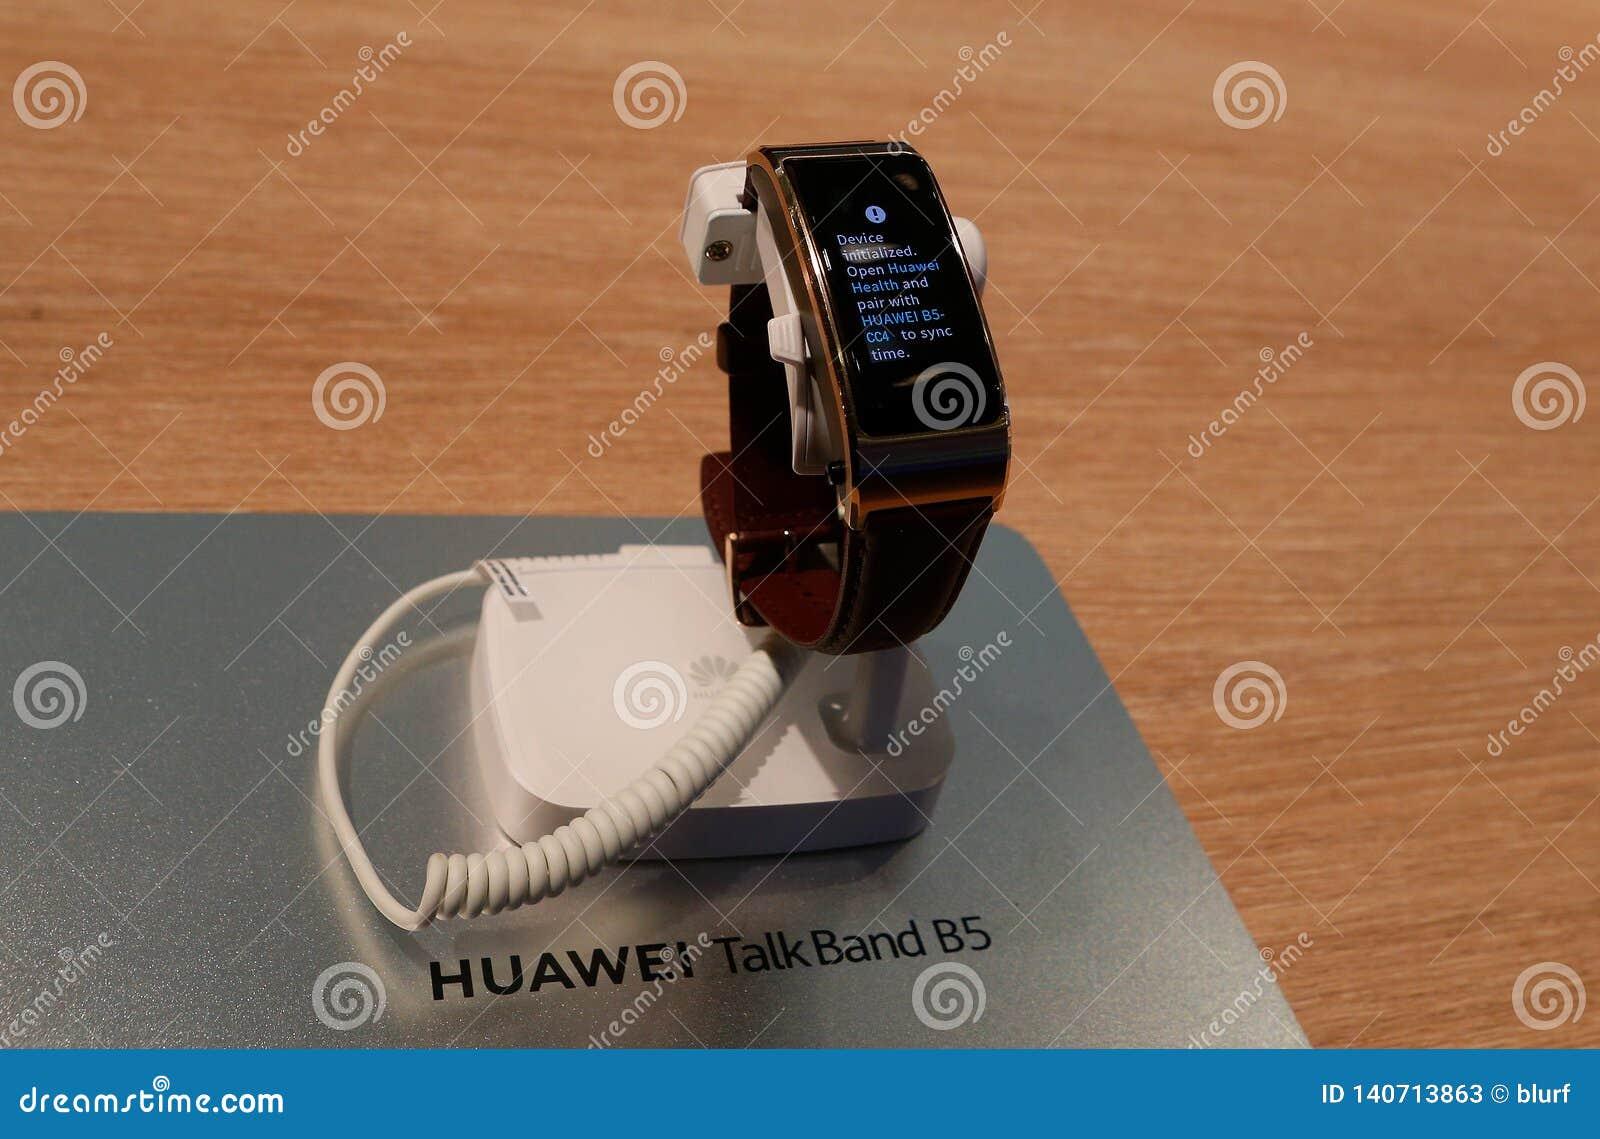 Huawei Smartwatch TalkBand B5 Shown At Mobile World Congress